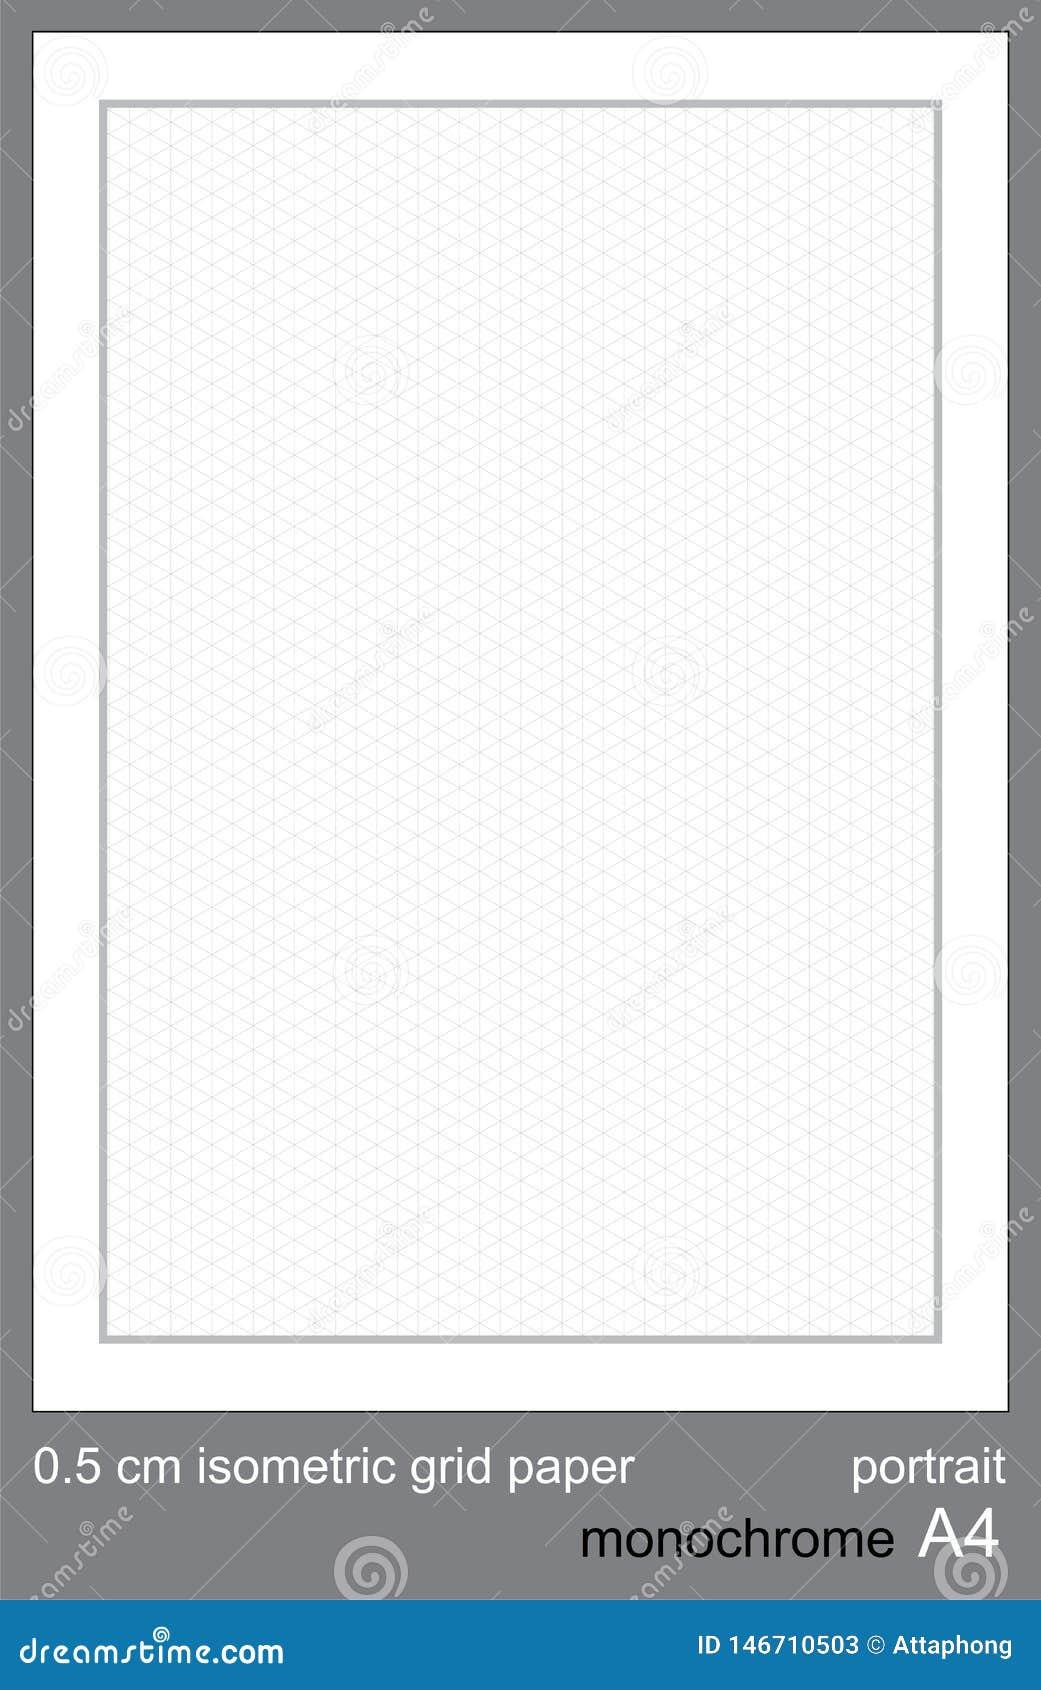 0 5 cm a4 isometric grid paper isometric grid vector